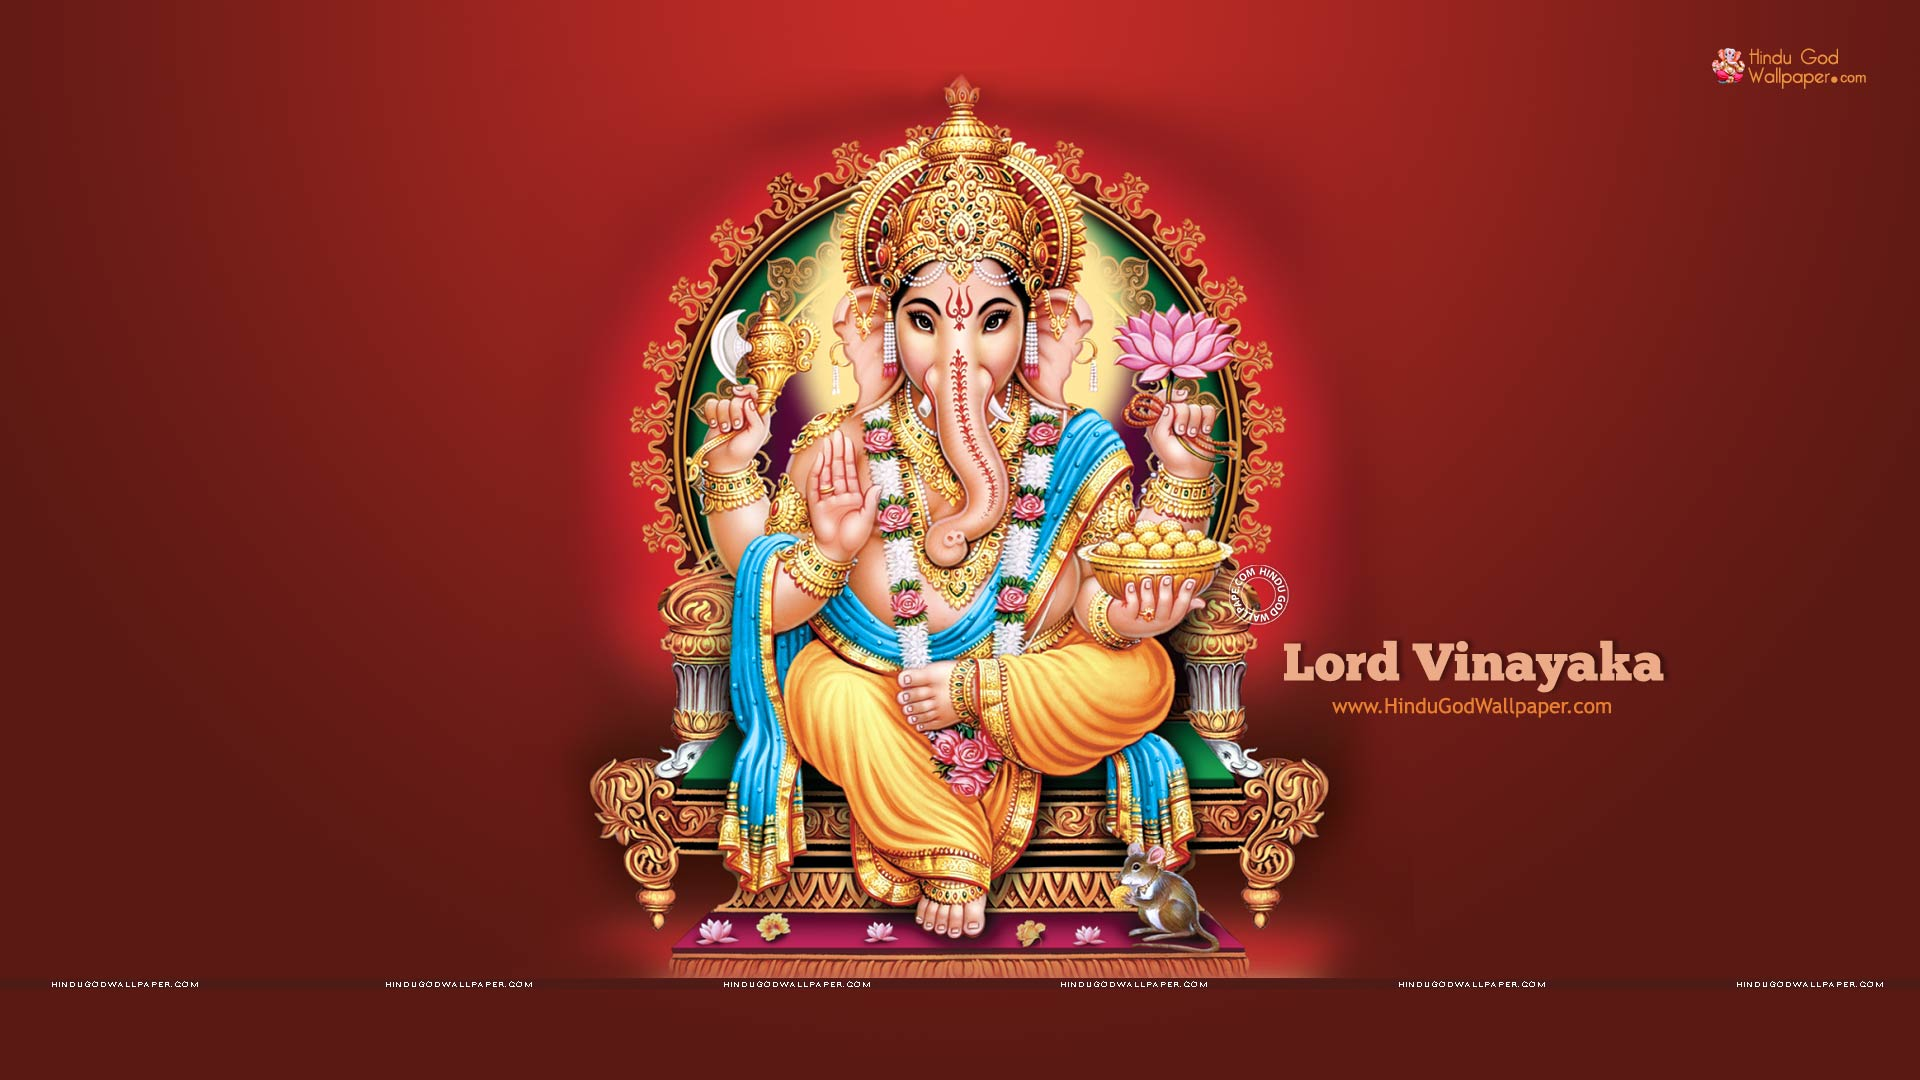 1080p lord vinayaka hd wallpaper full size download